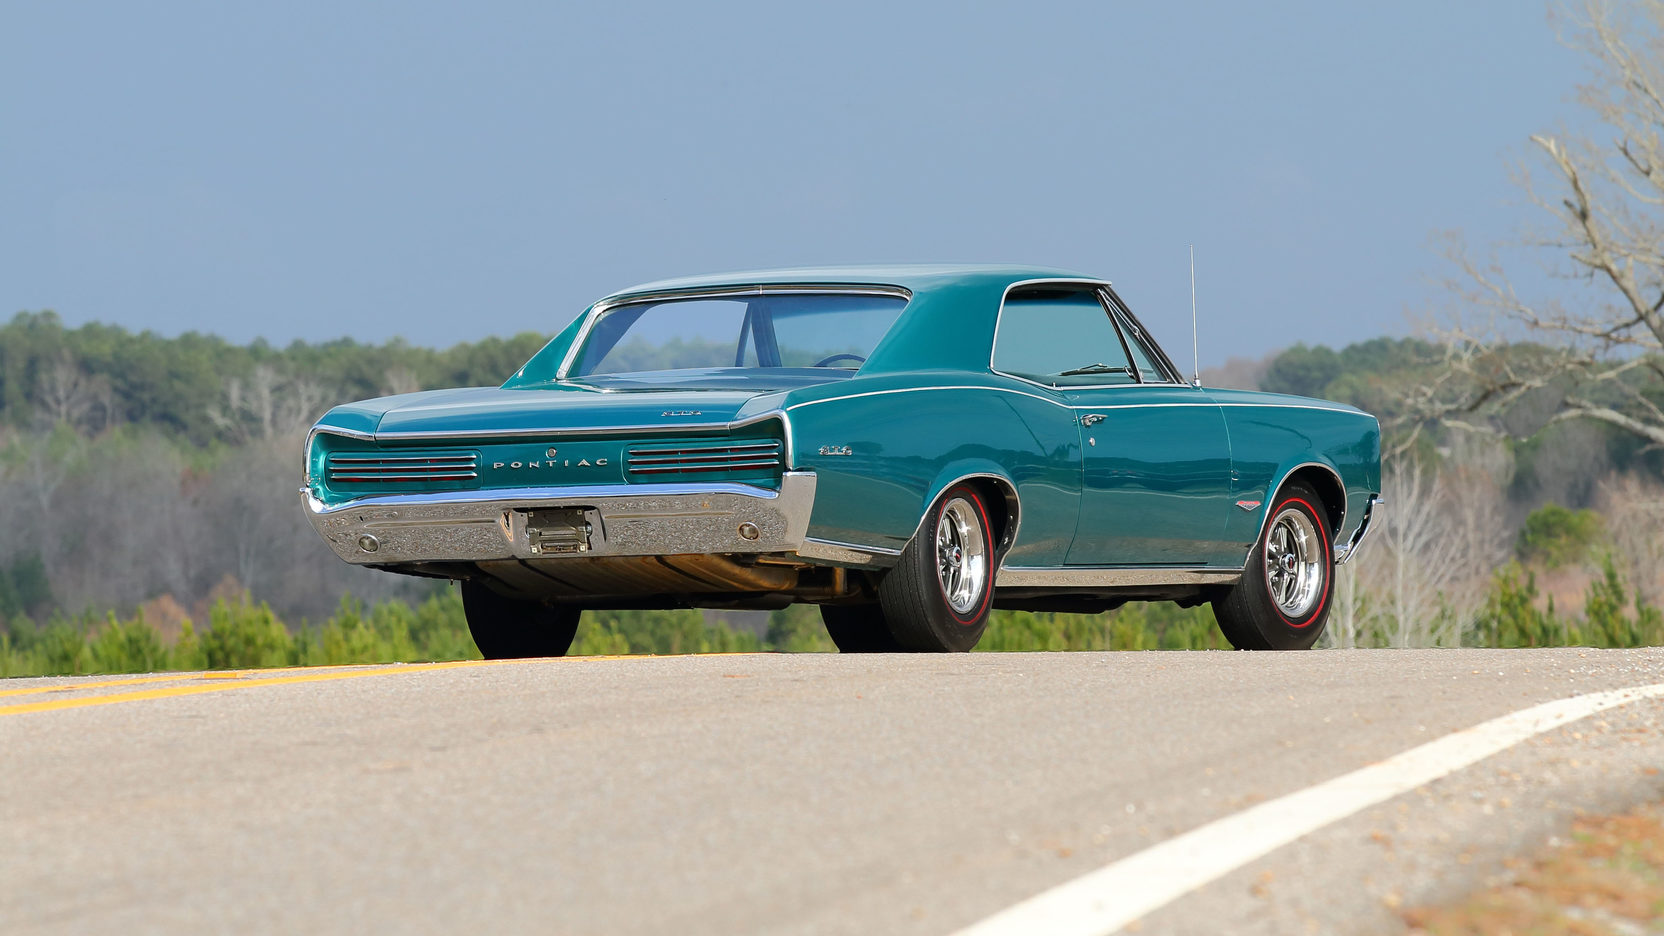 1966 Pontiac GTO teal rear view